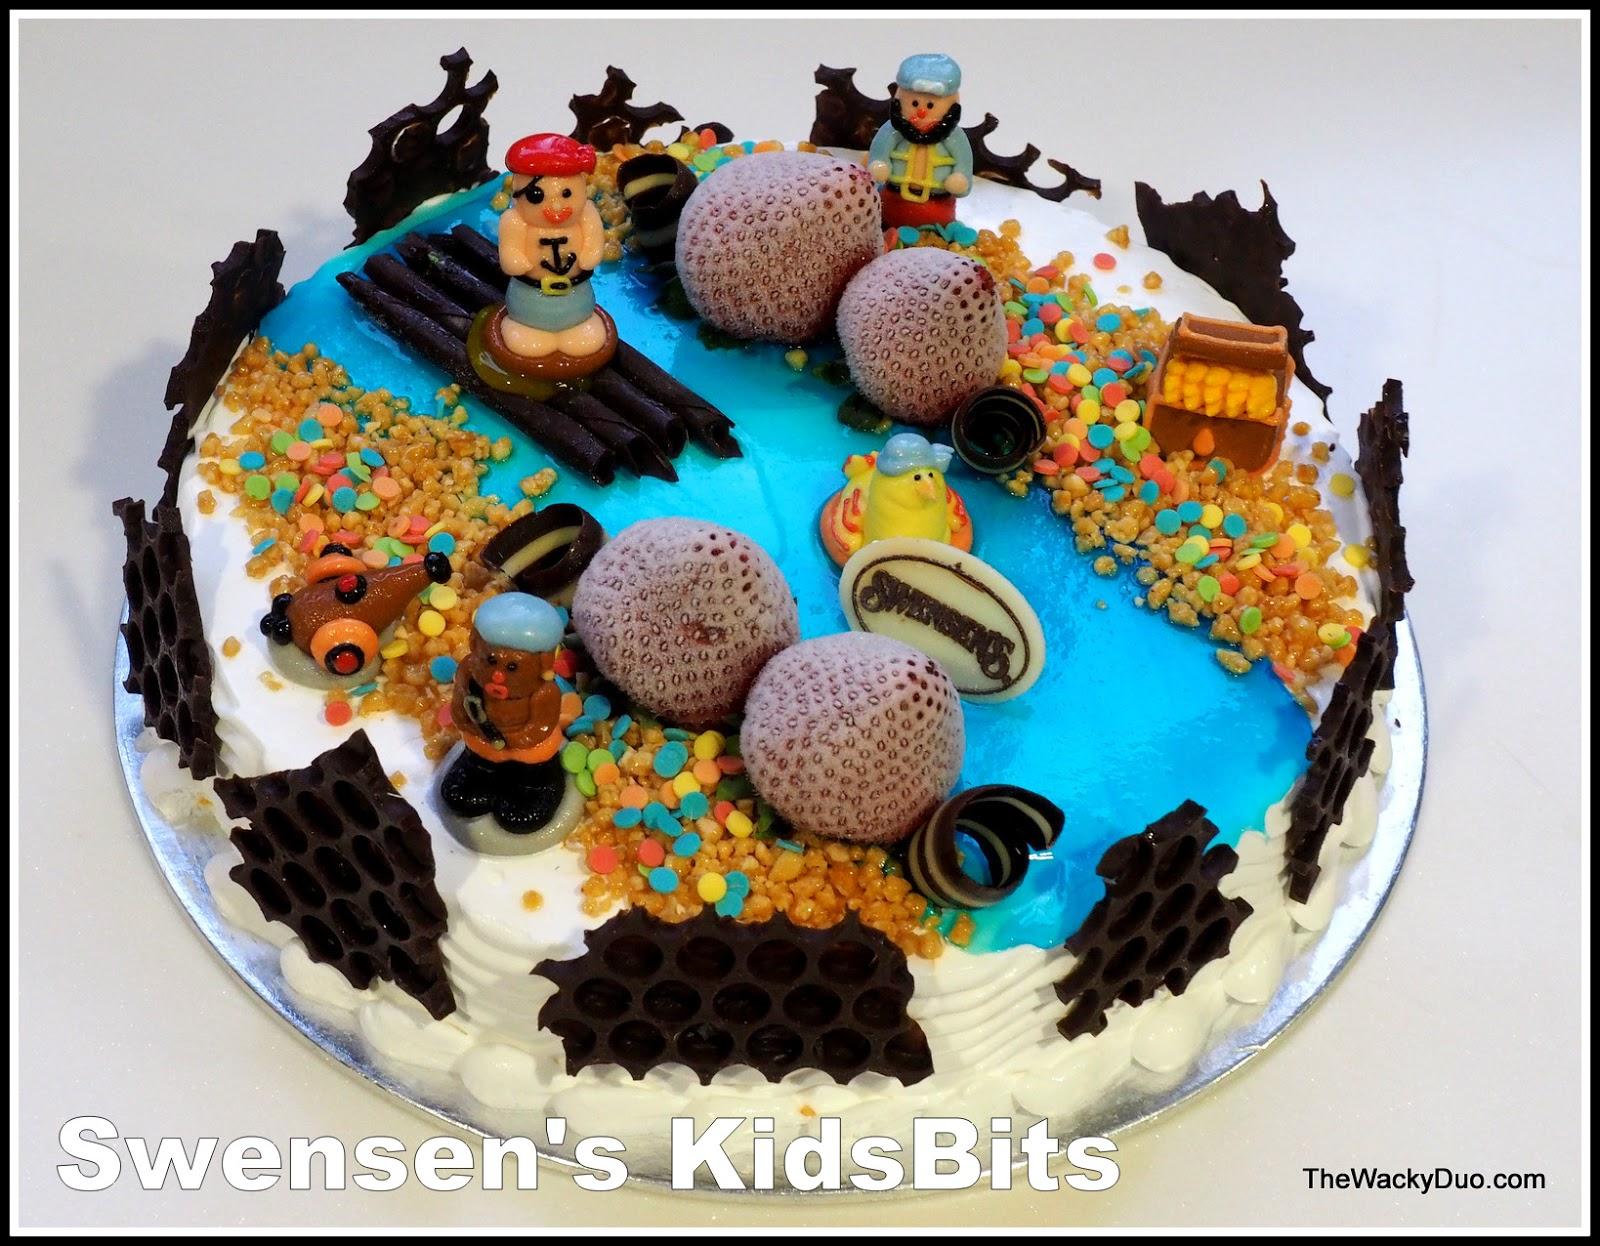 Swensens Kidsbits Ice Cream Cakes For Kids The Wacky Duo